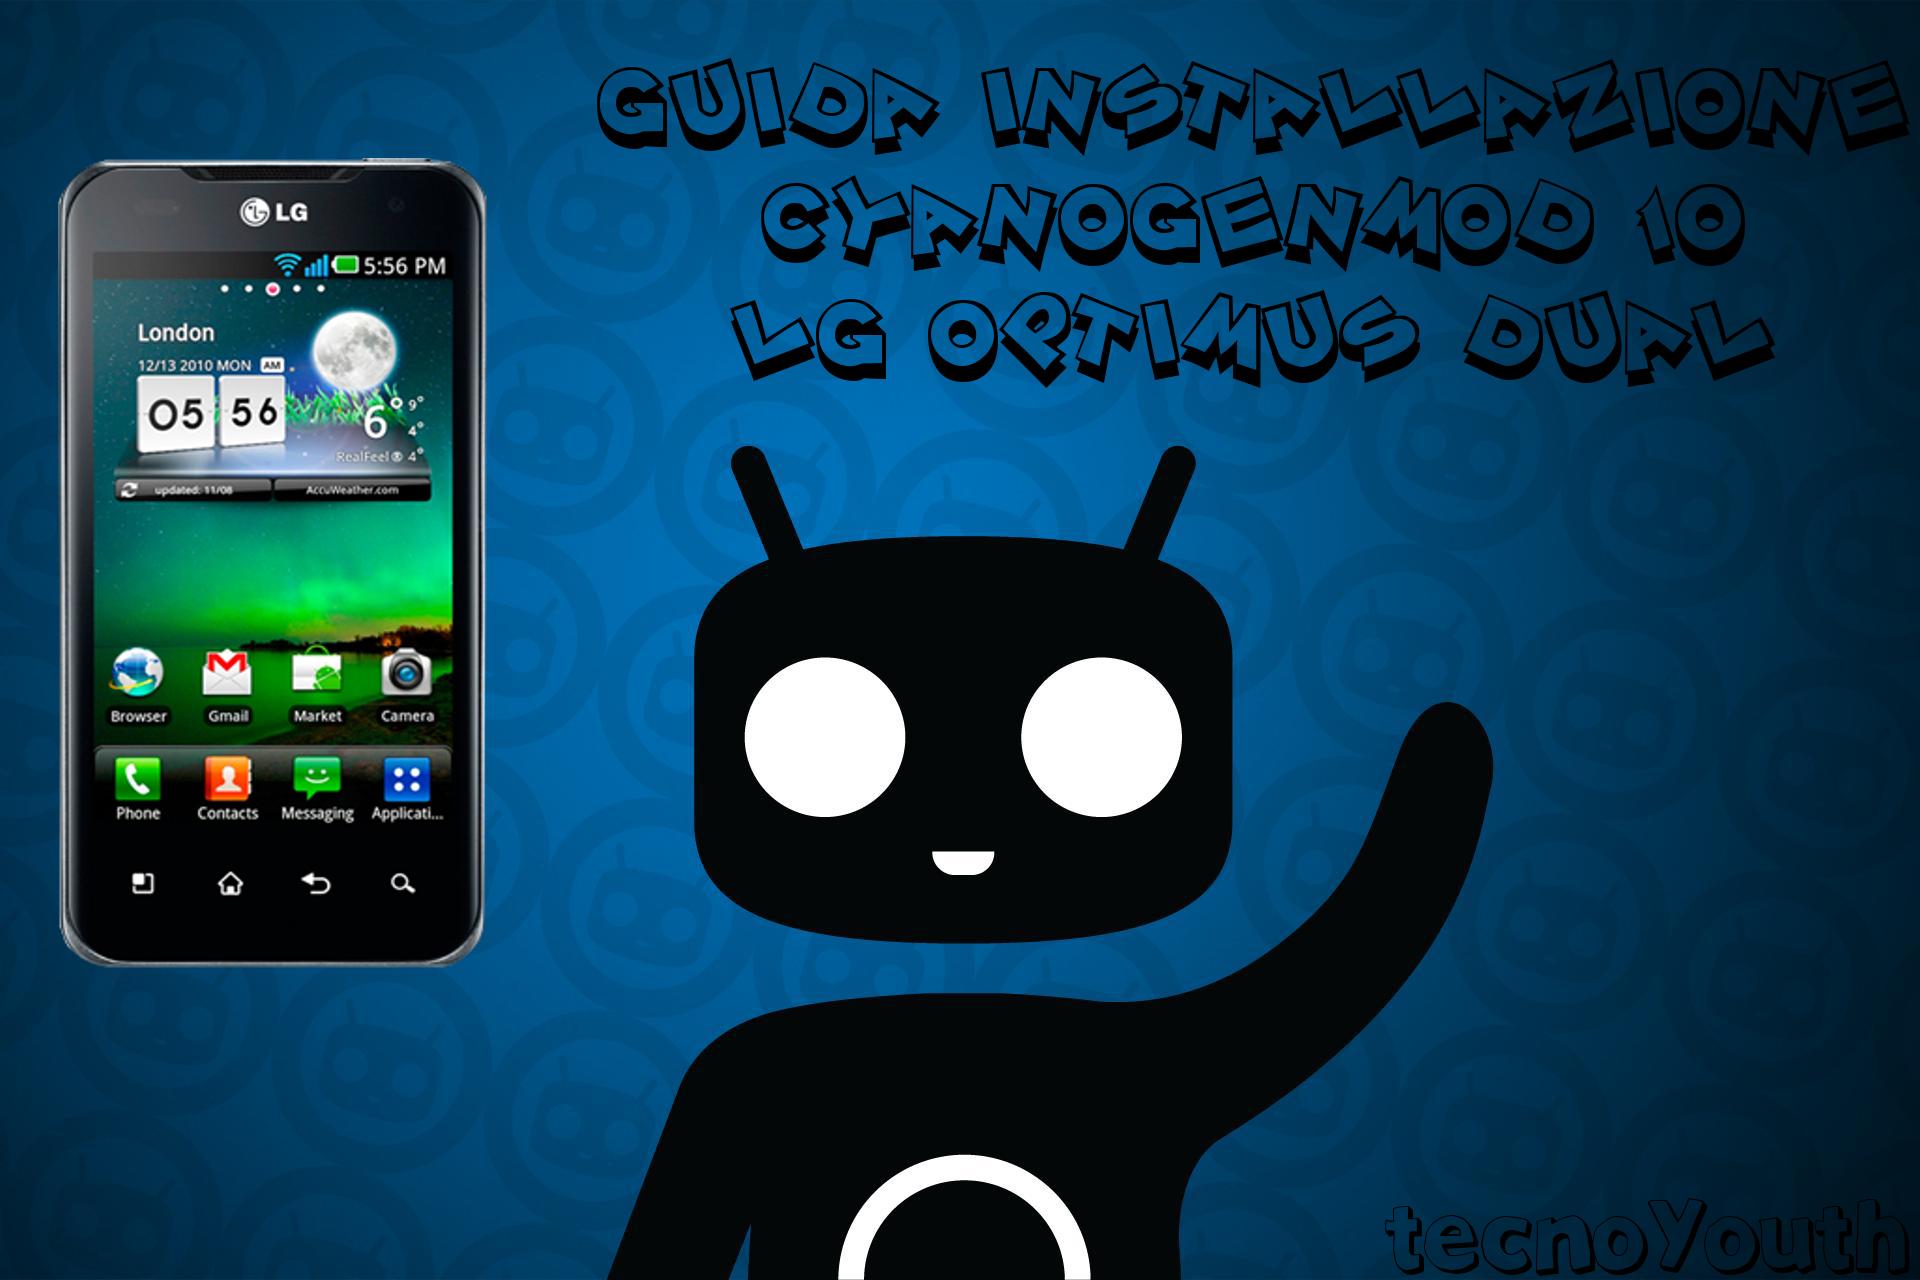 LG Optimus Dual CyanogenMod 10